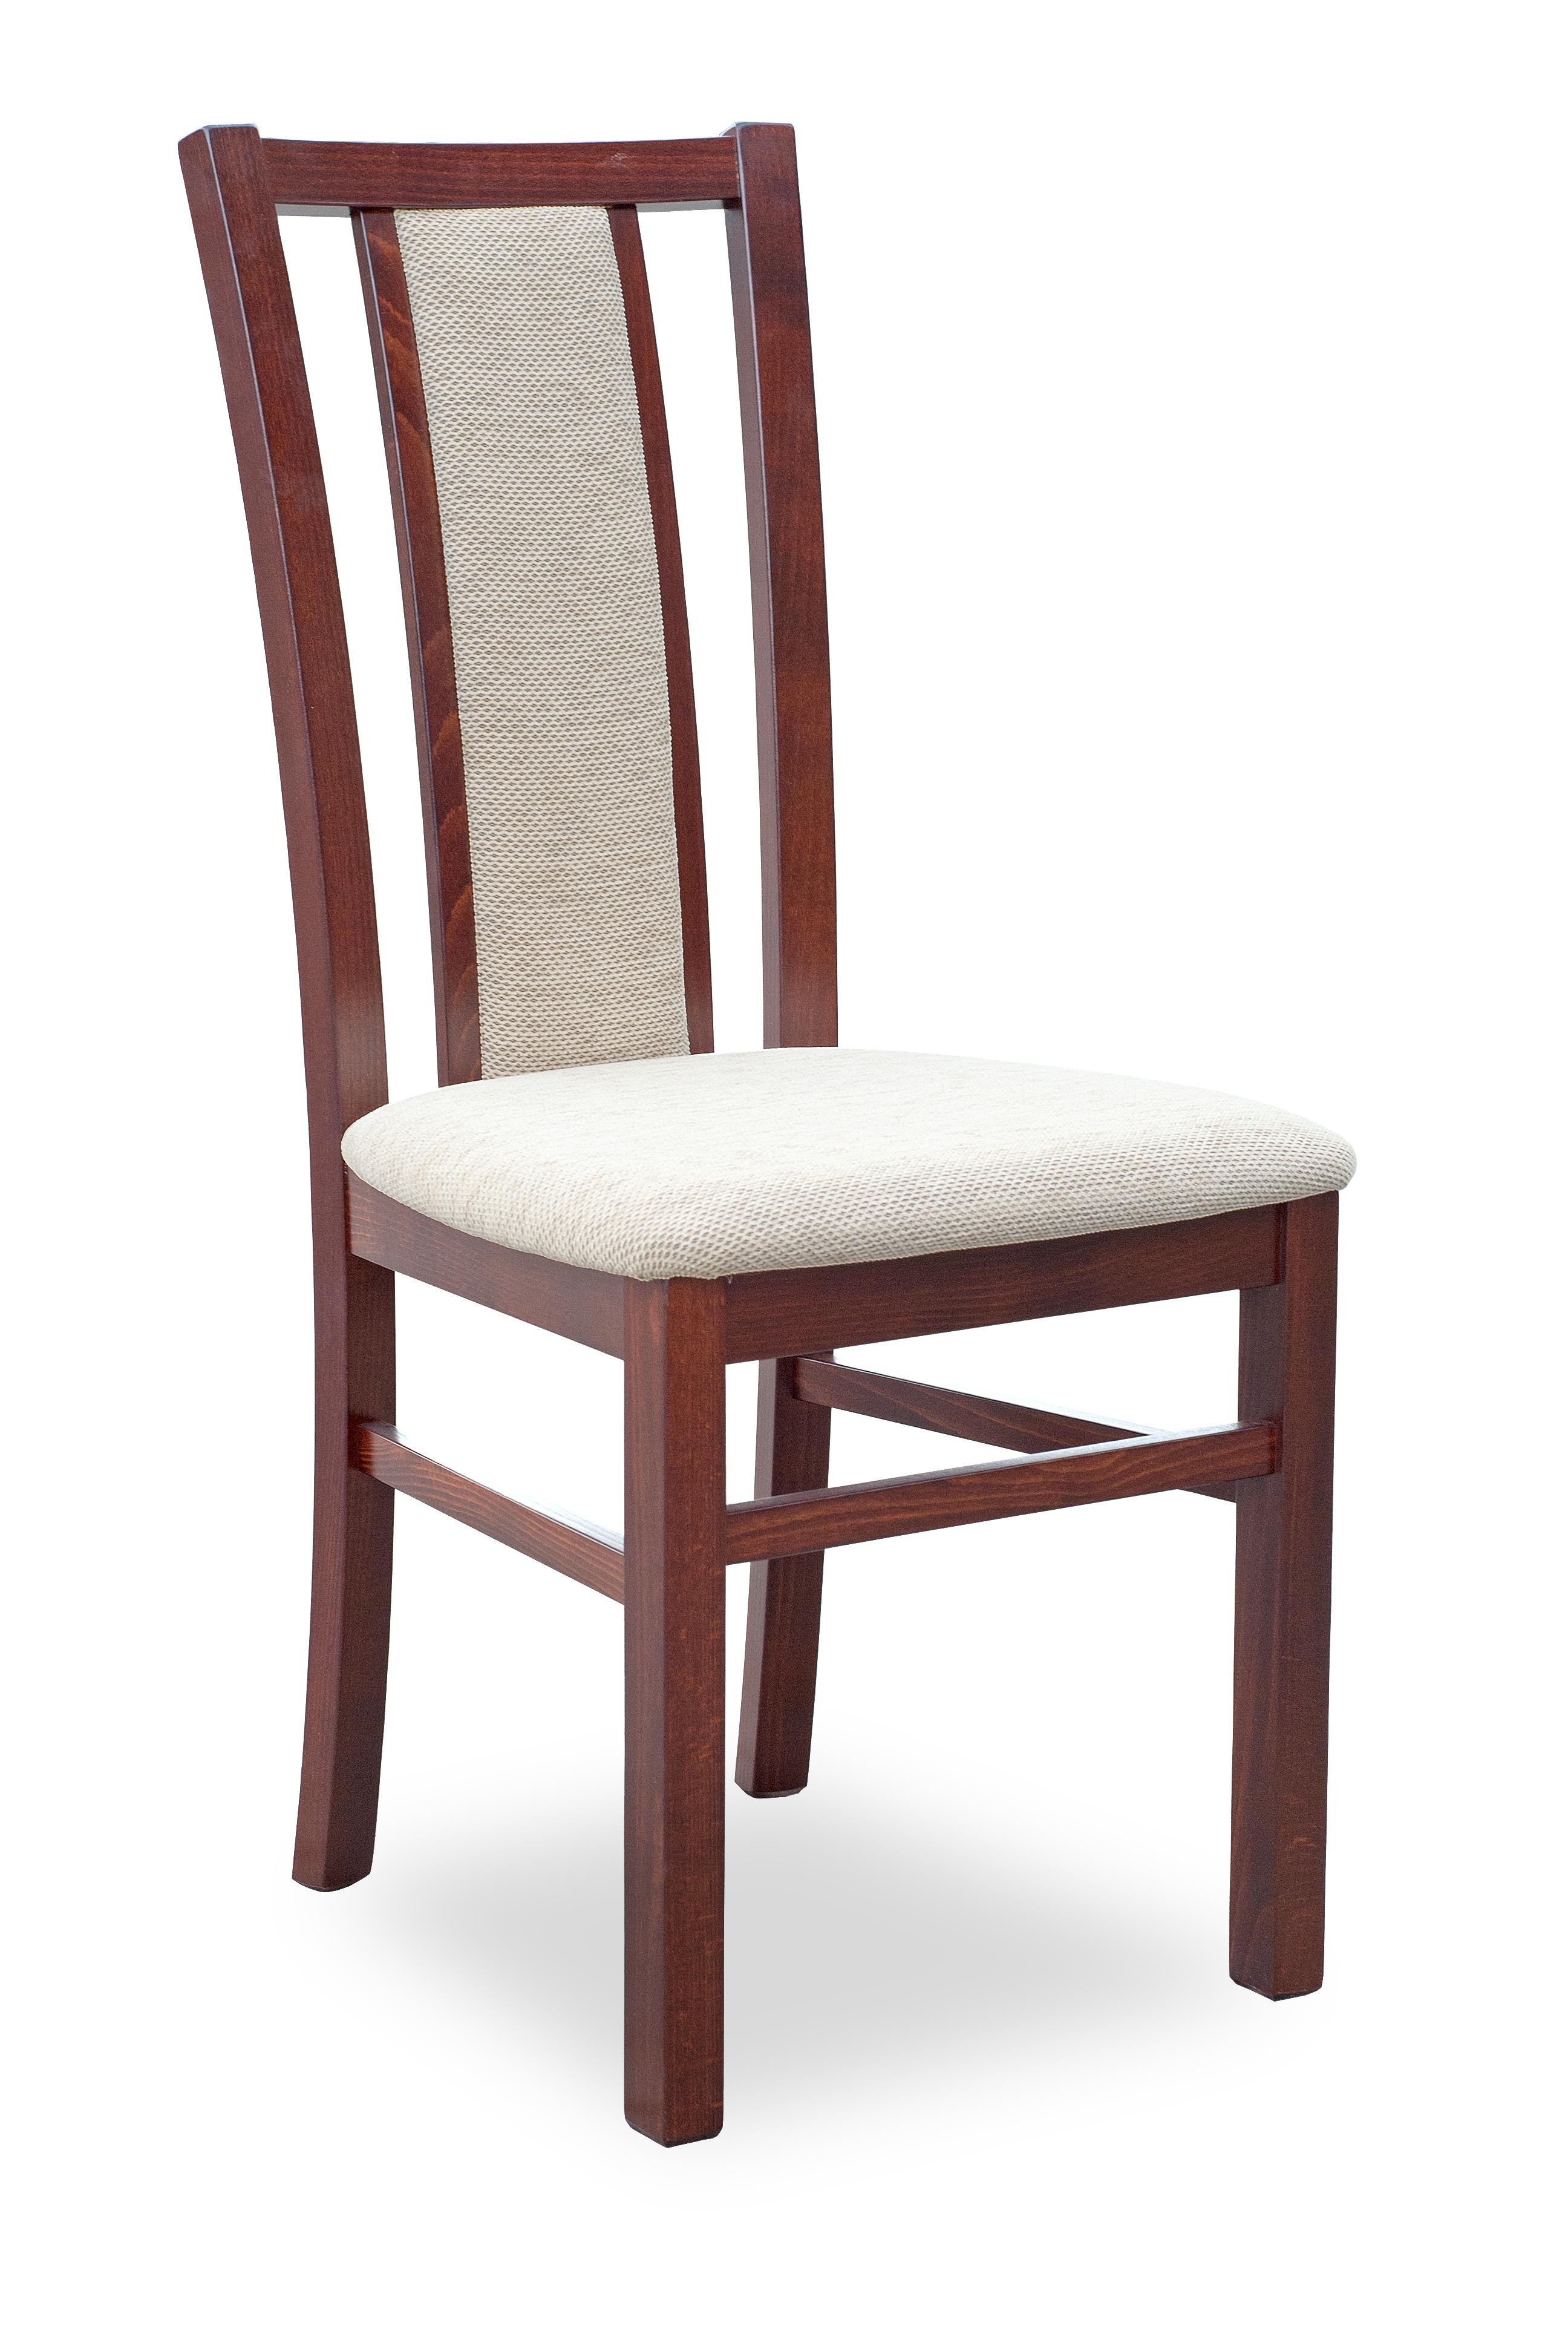 Jedálenská stolička - Halmar - GERARD 8 Orech tmavý